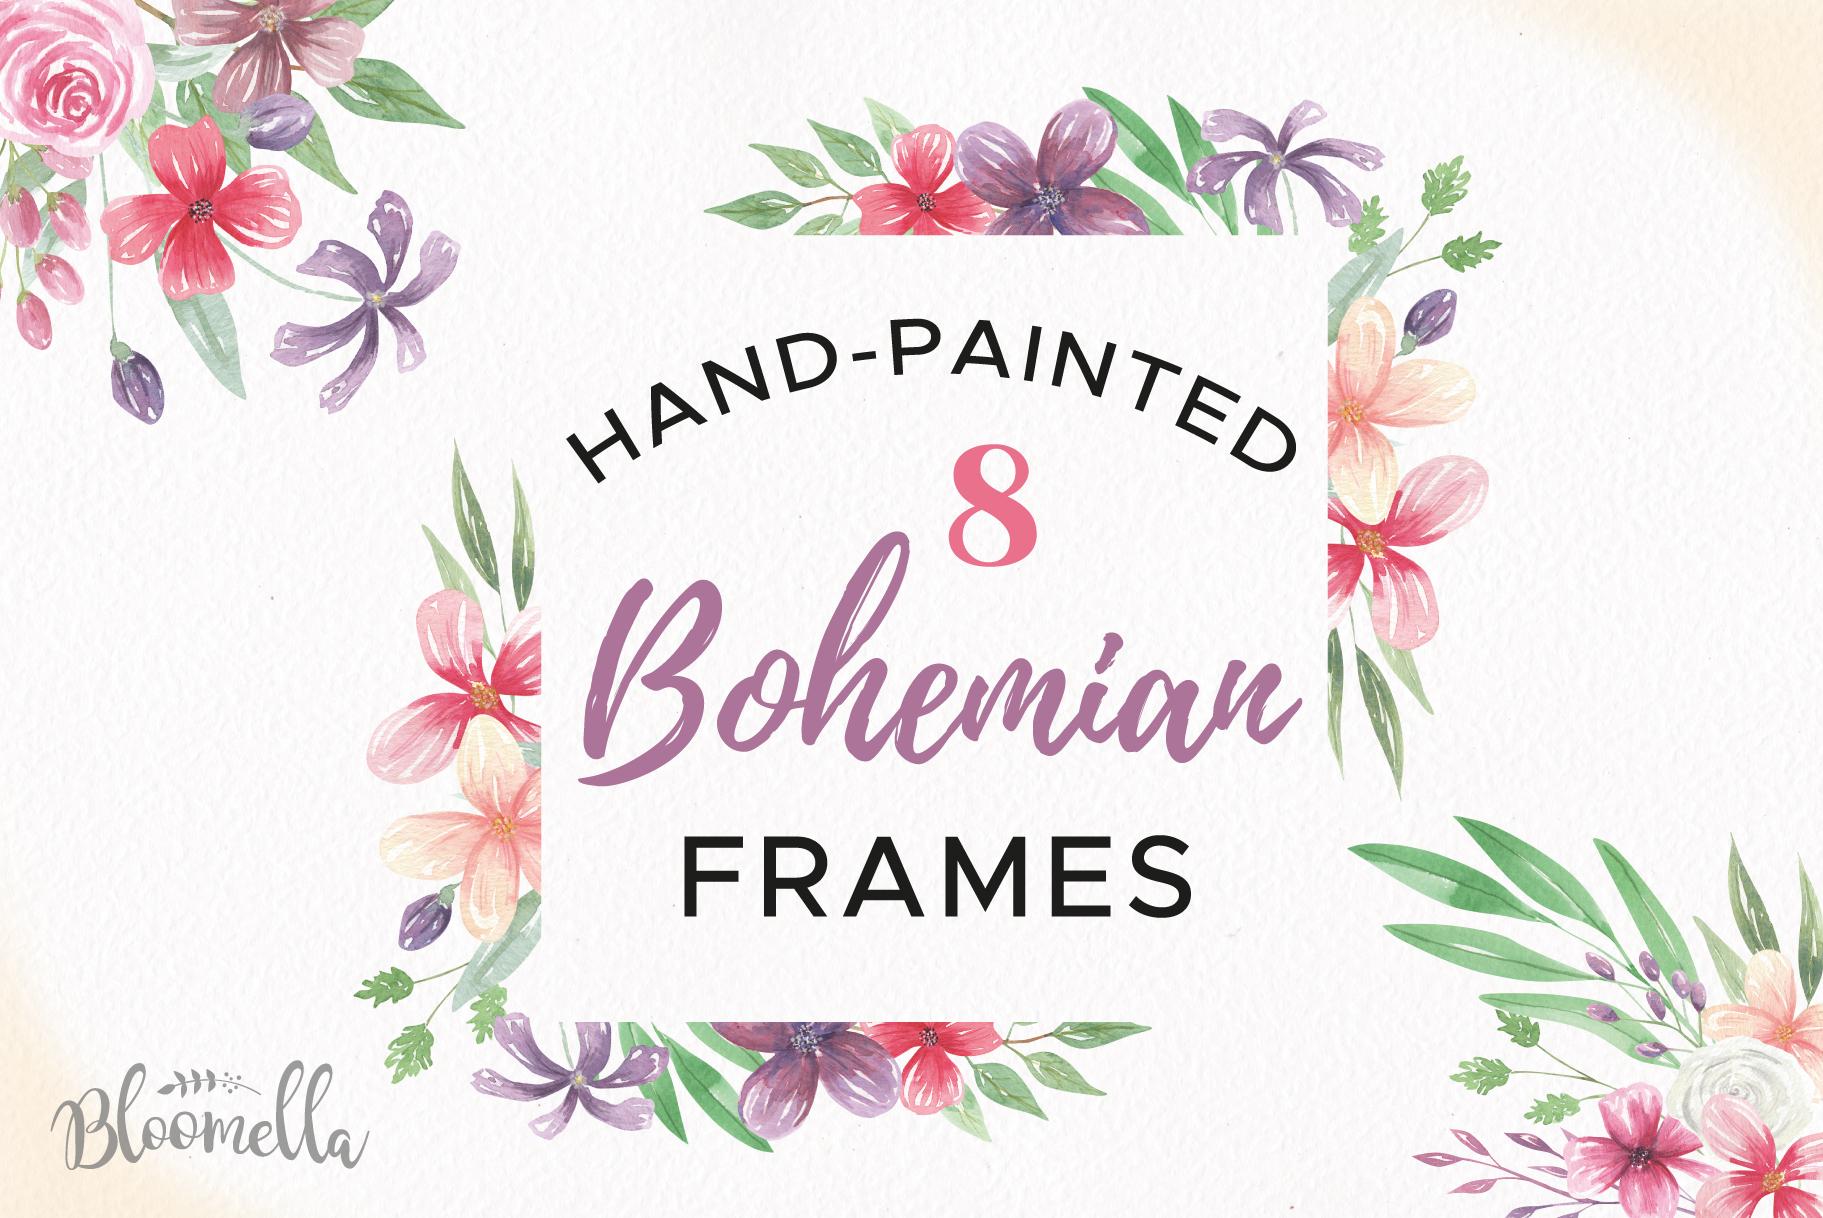 Bohemian Watercolor Clipart Frames Border Flowers Boho Pink Purple